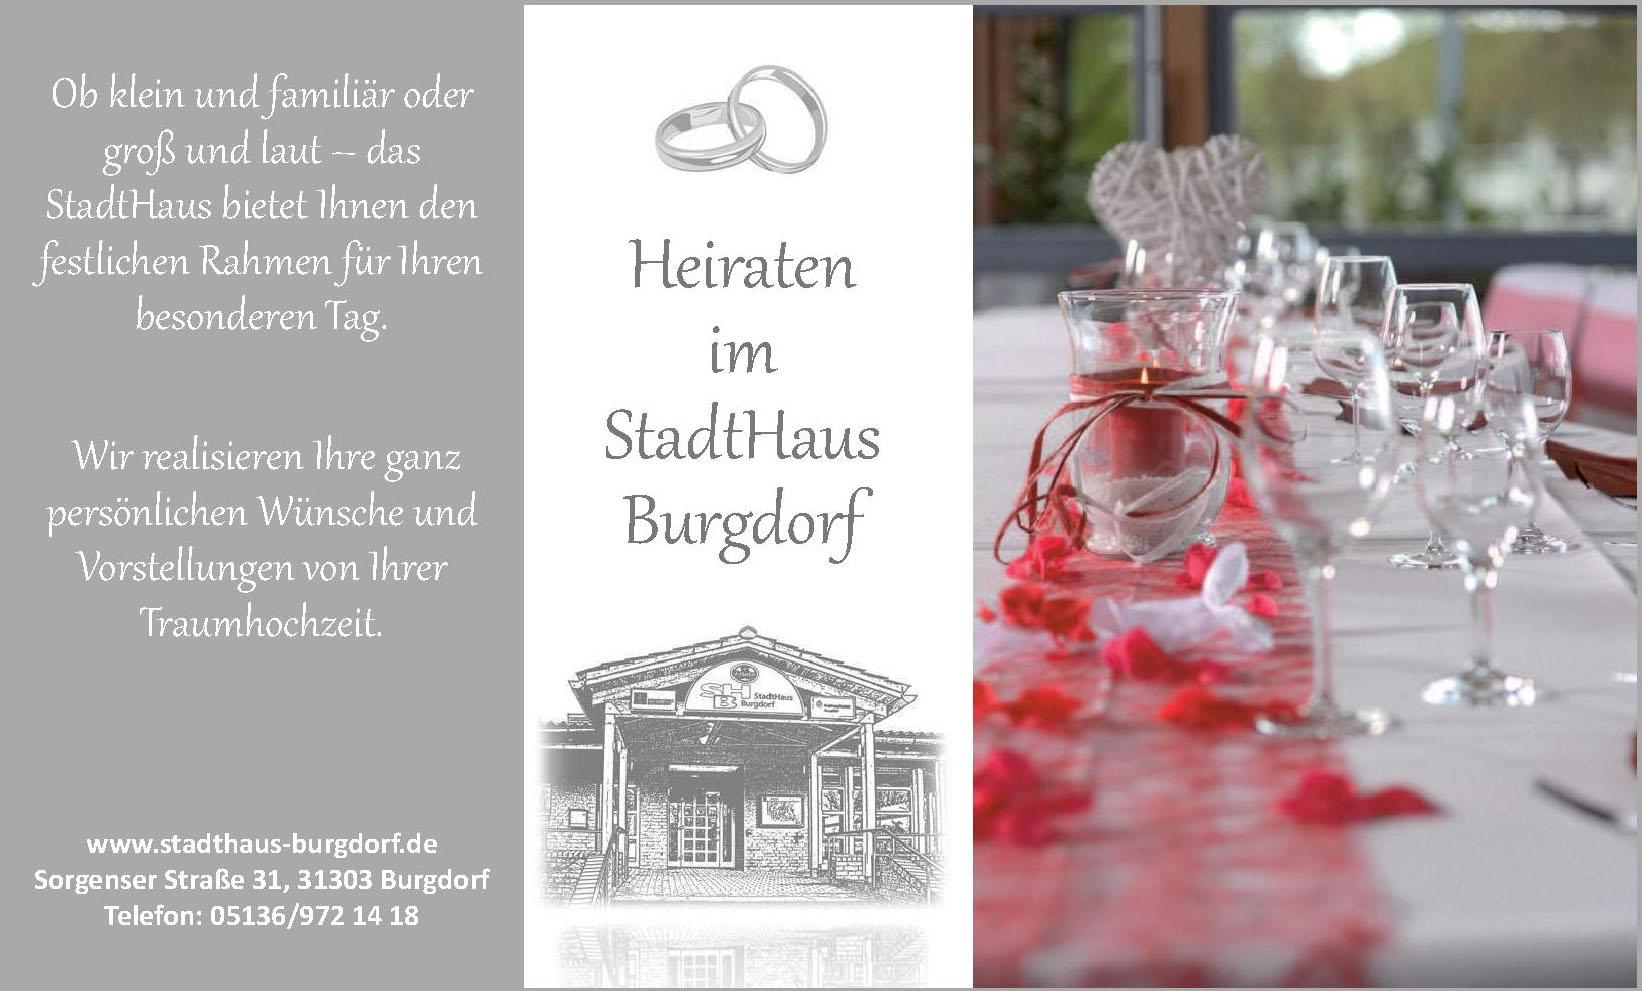 Stadthaus Burgdorf